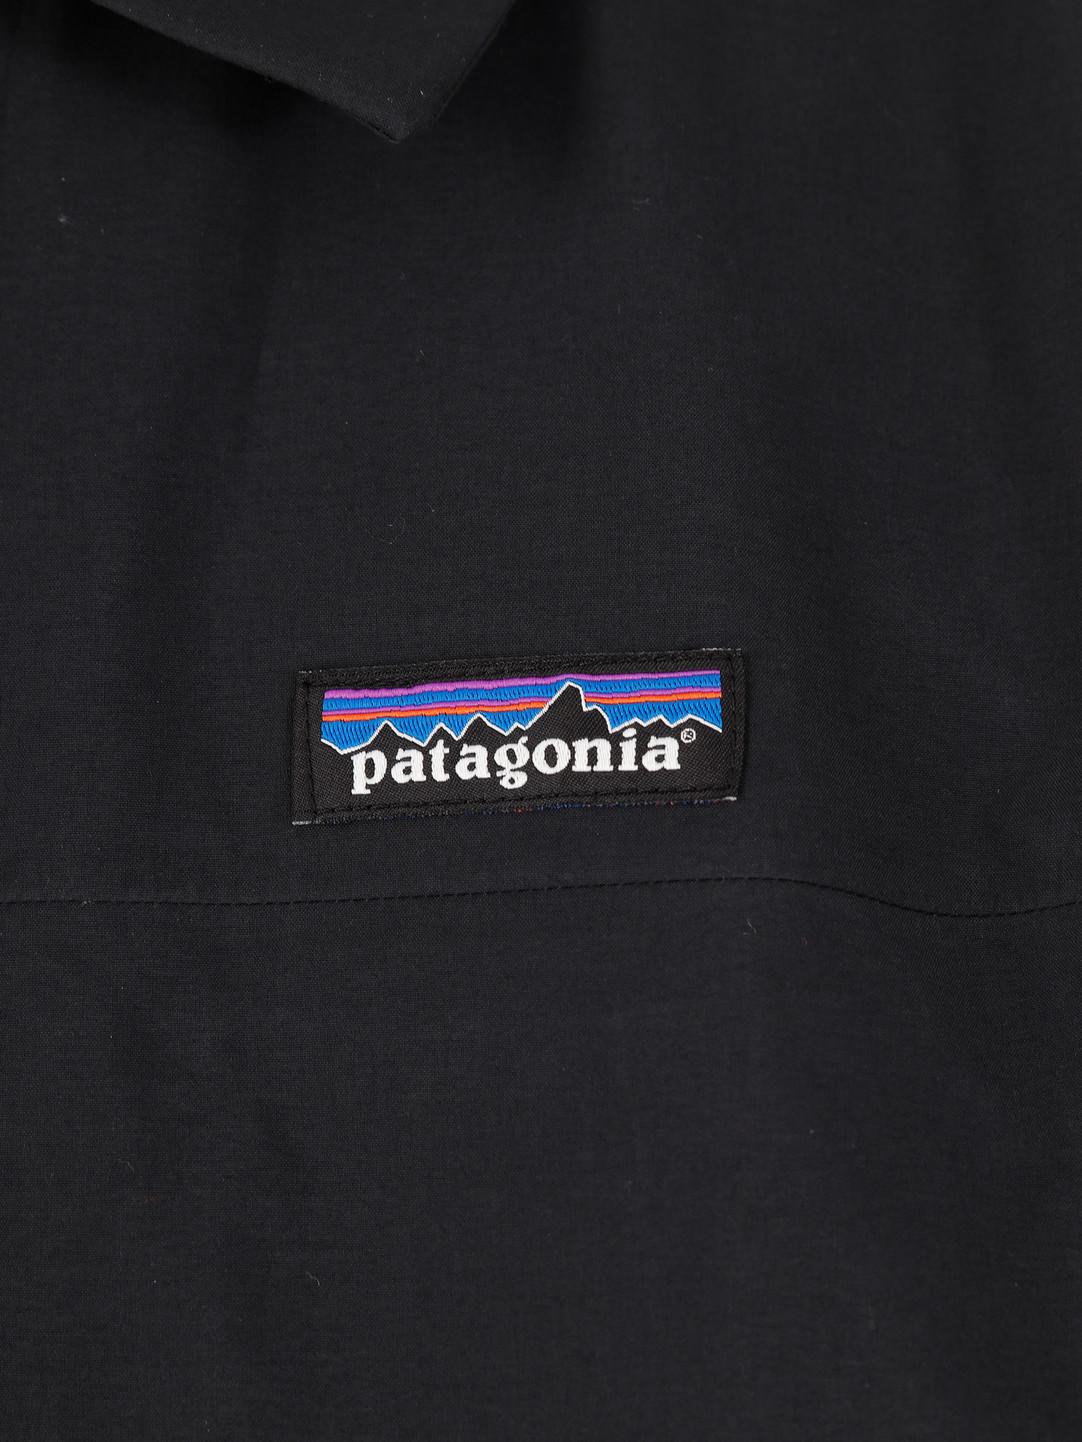 Patagonia Patagonia M's City Storm Rain Parka Black 20700